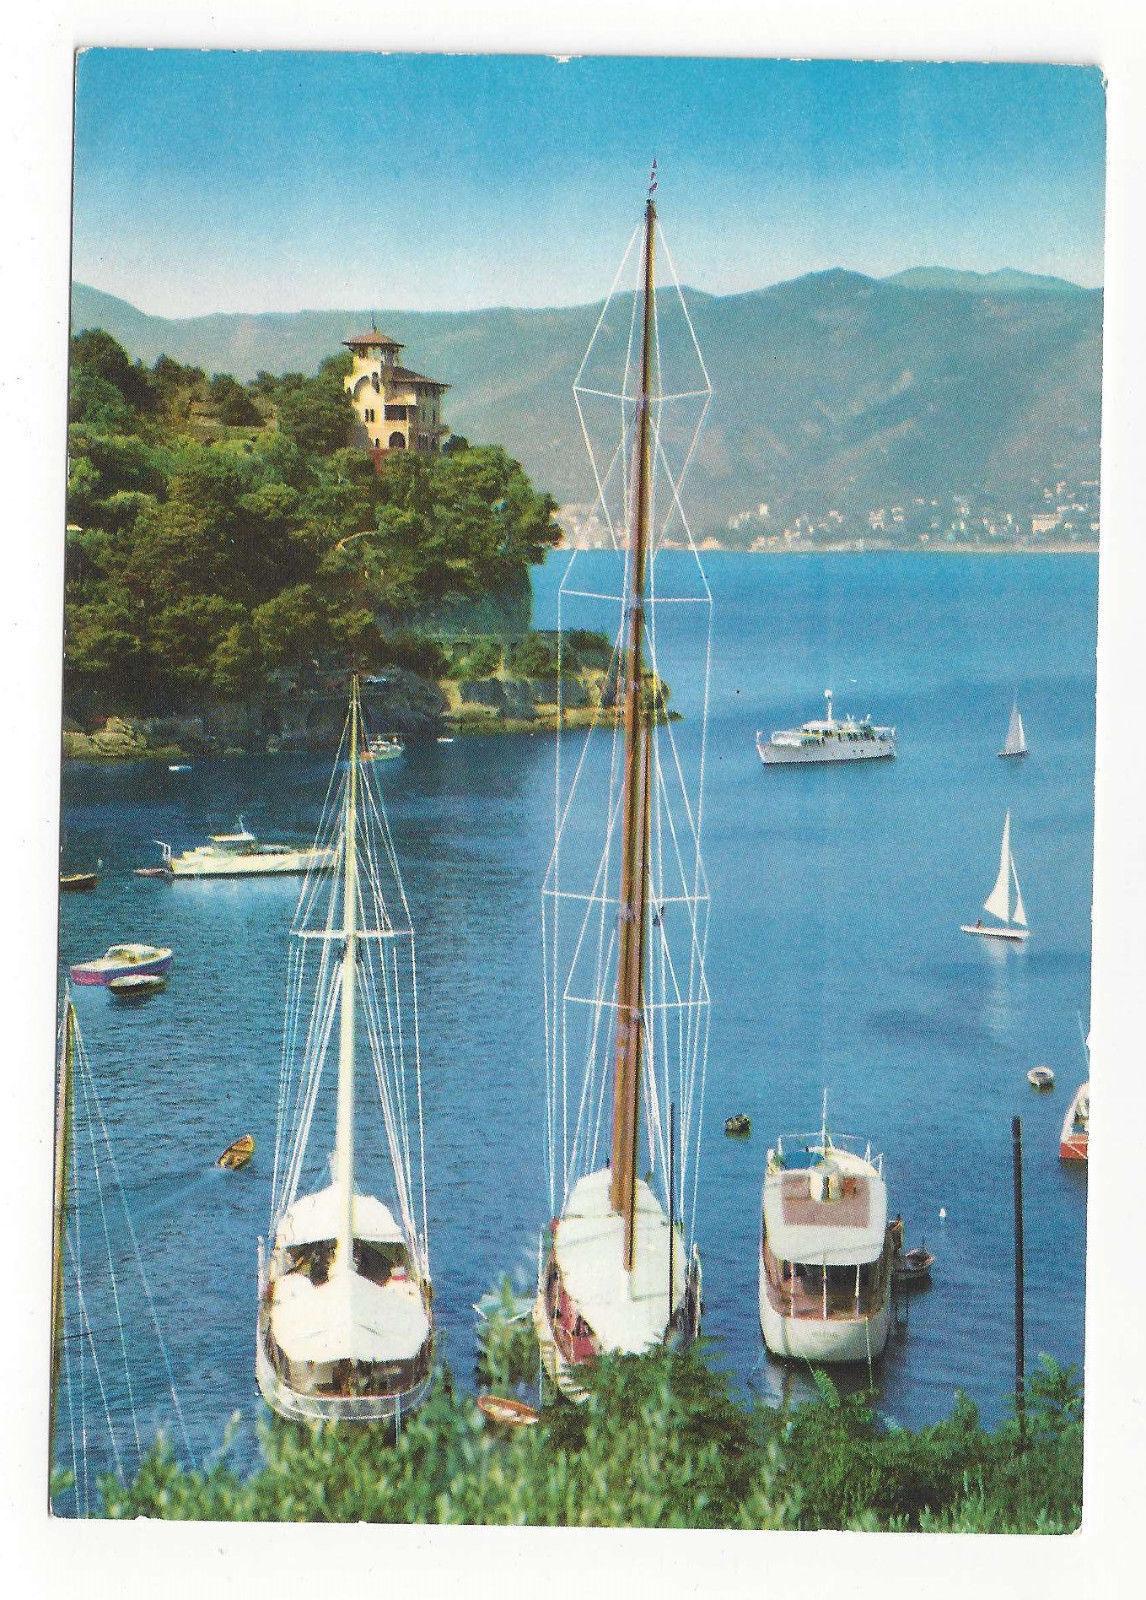 Italy Portofino Genoa Riviera Panfili all'ancora Yachts Sailing Vtg Postcard 4X6